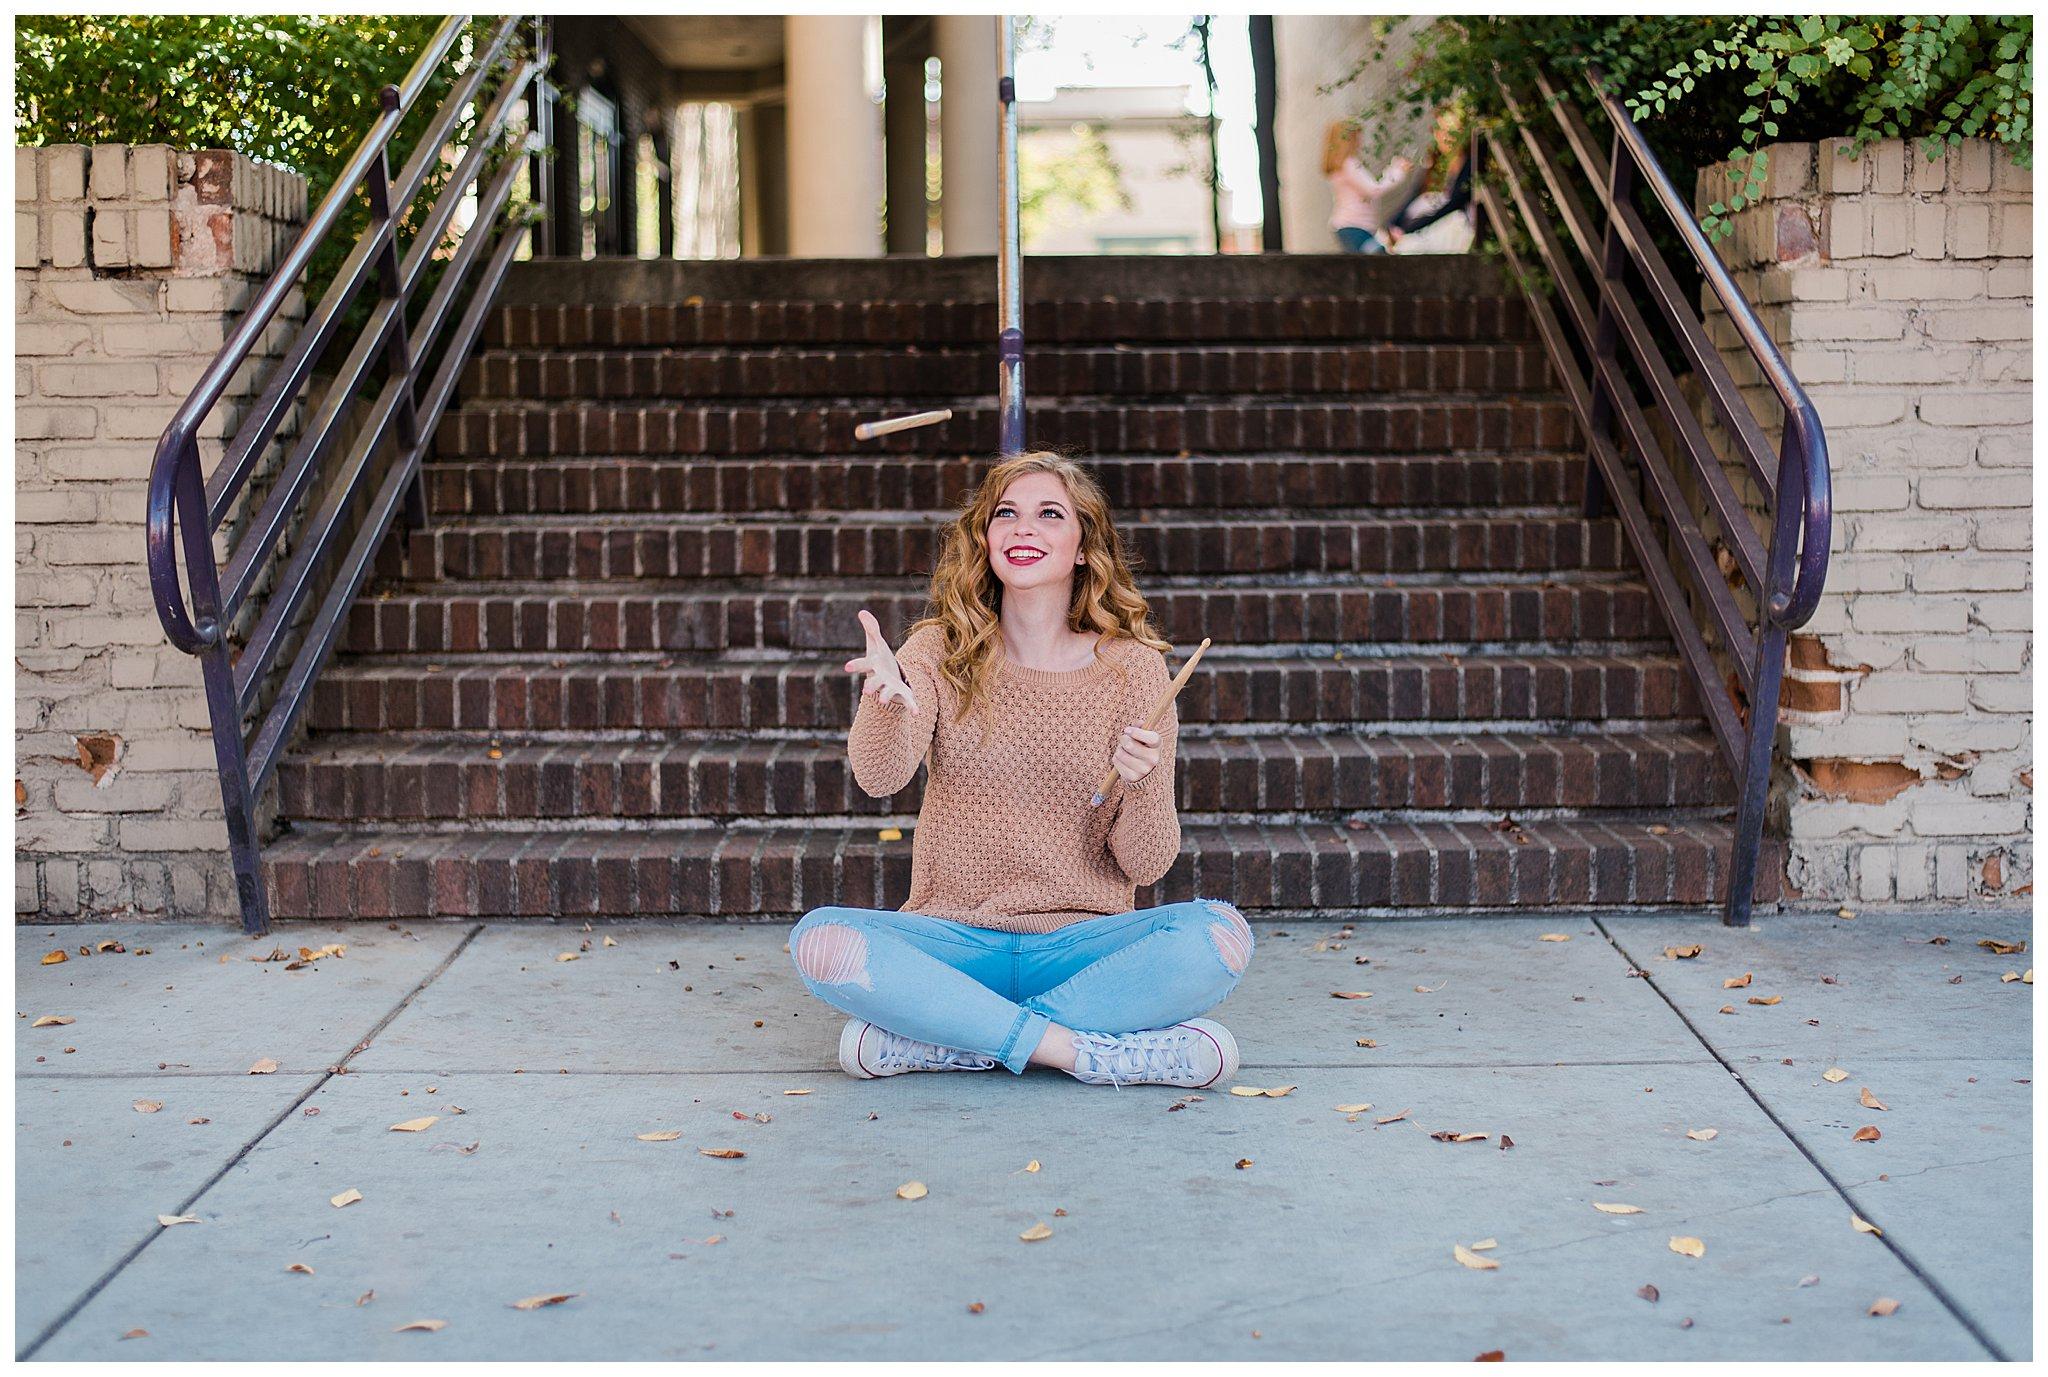 Boise Senior Photographer, Idaho, graduation, Boise, natural posing, laughter, girls senior photos, drums, summer aesthetic, senior photography, fun senior pictures, summer photos, SS Photography & Design, Sadie Shirts